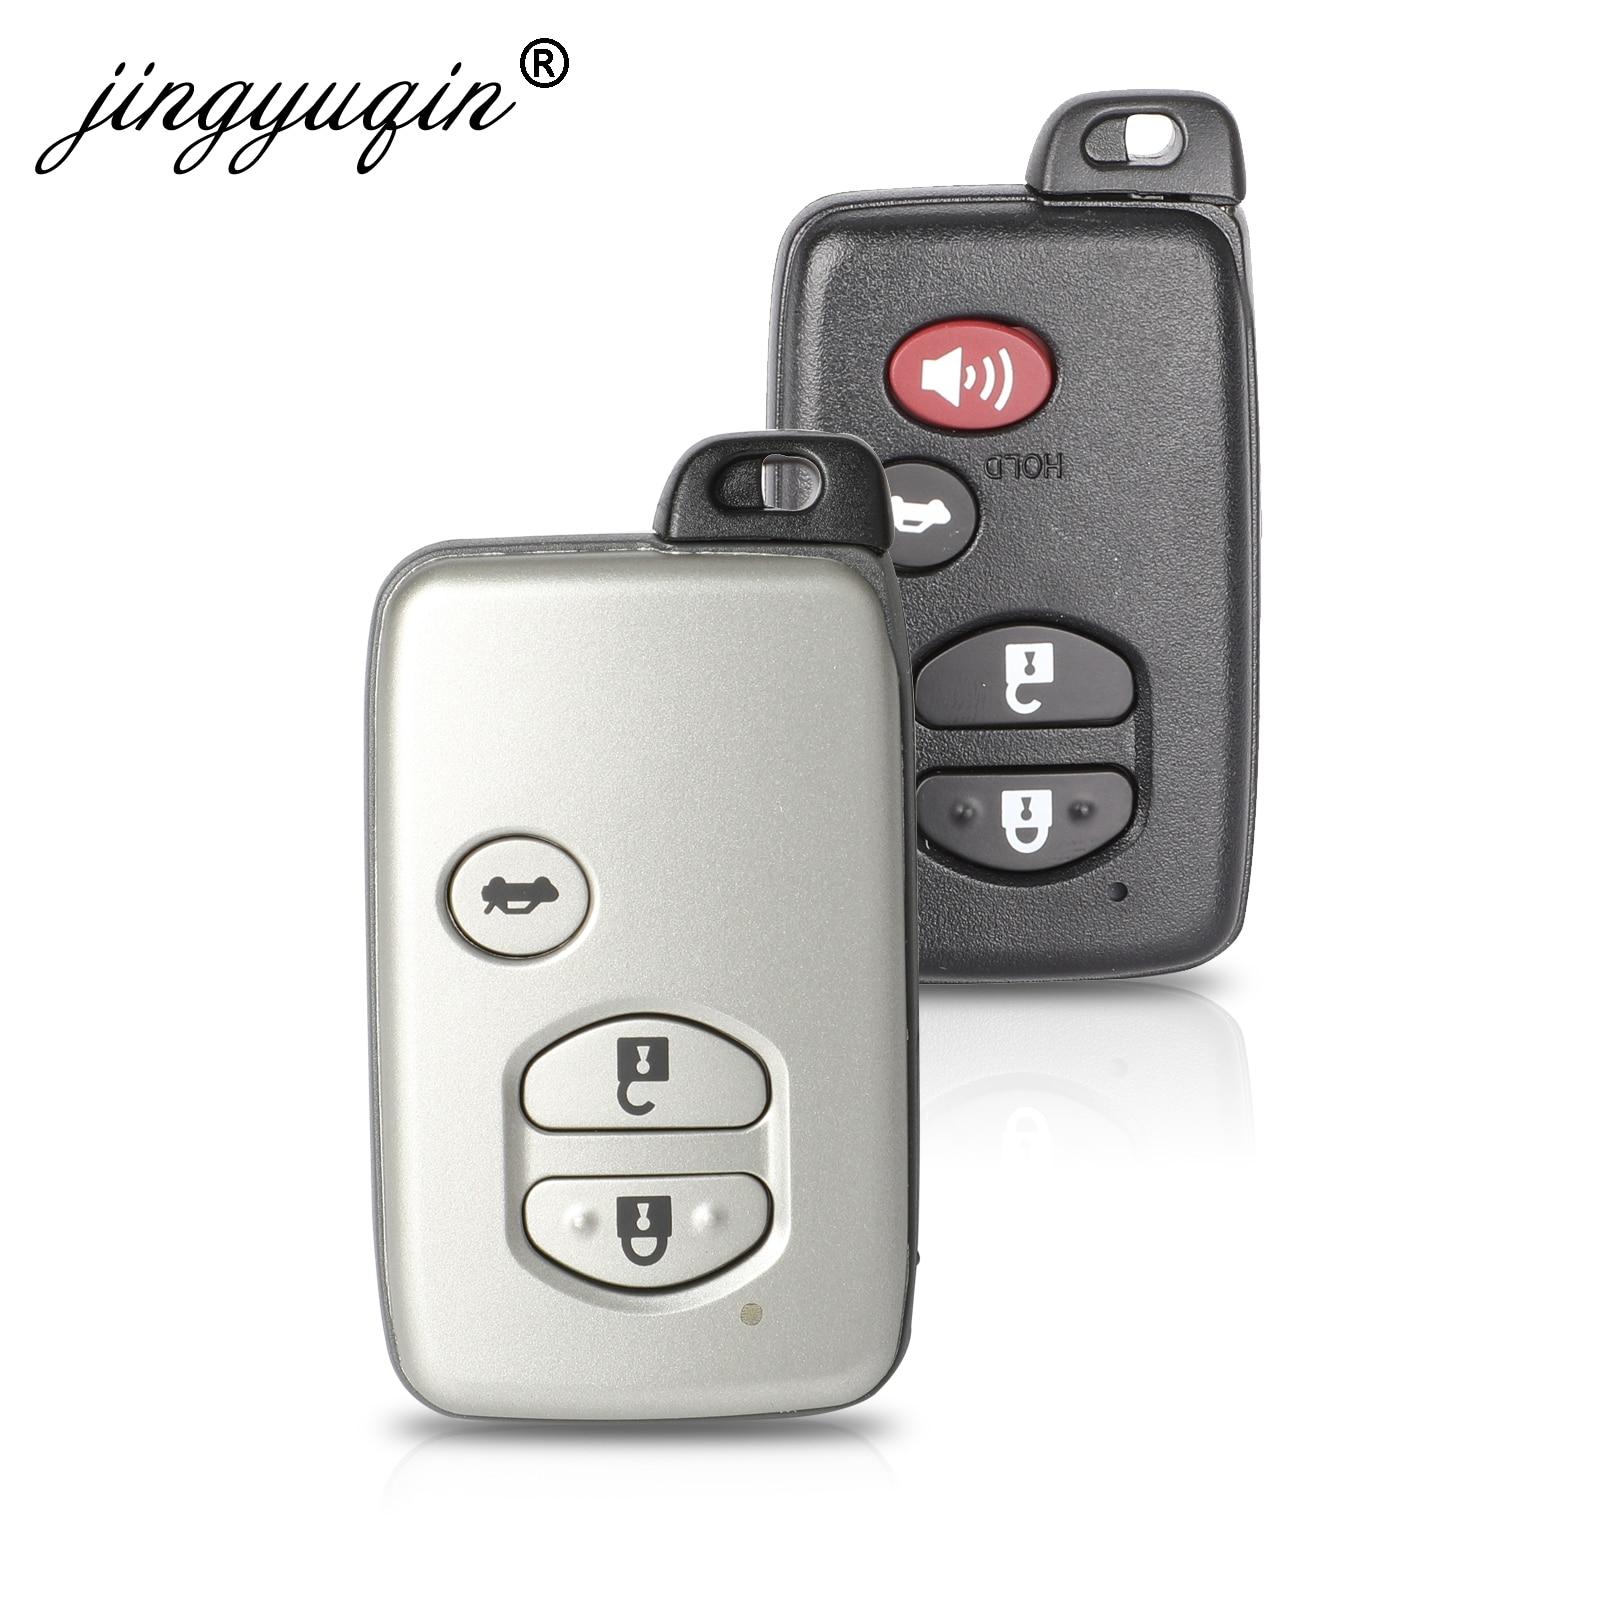 Bilchave 3/4 botones remoto de silicona Smart Key funda carcasa para Toyota Land Cruiser Prado 150 Camry Prius corona soporte